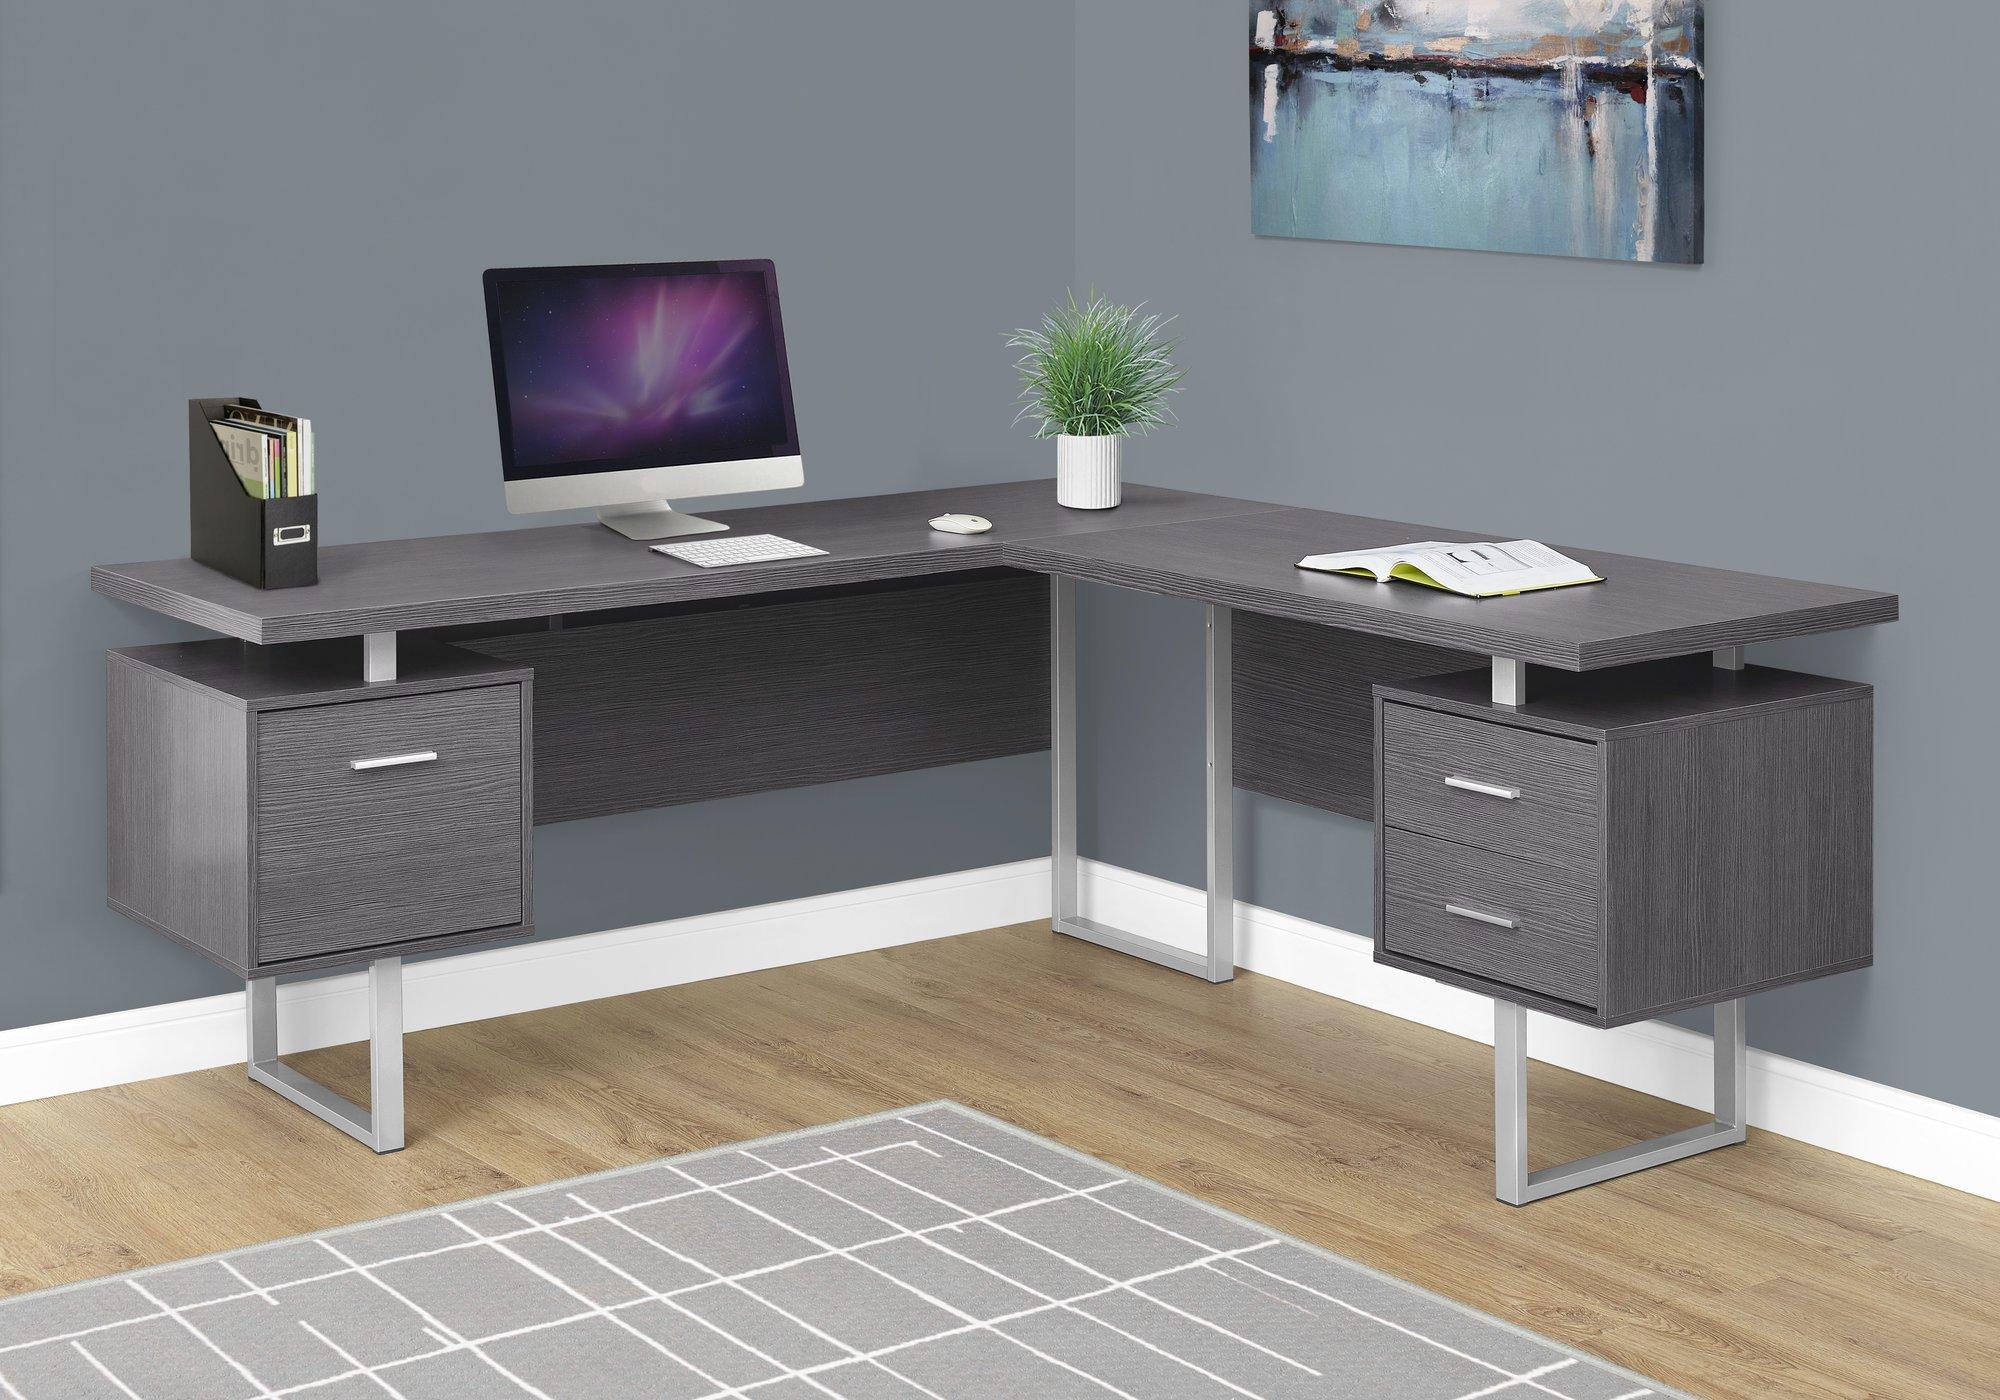 71 Grey Left Right Facing Corner Desk W Drawers In 2020 Contemporary Computer Desk Grey Desk Computer Desk